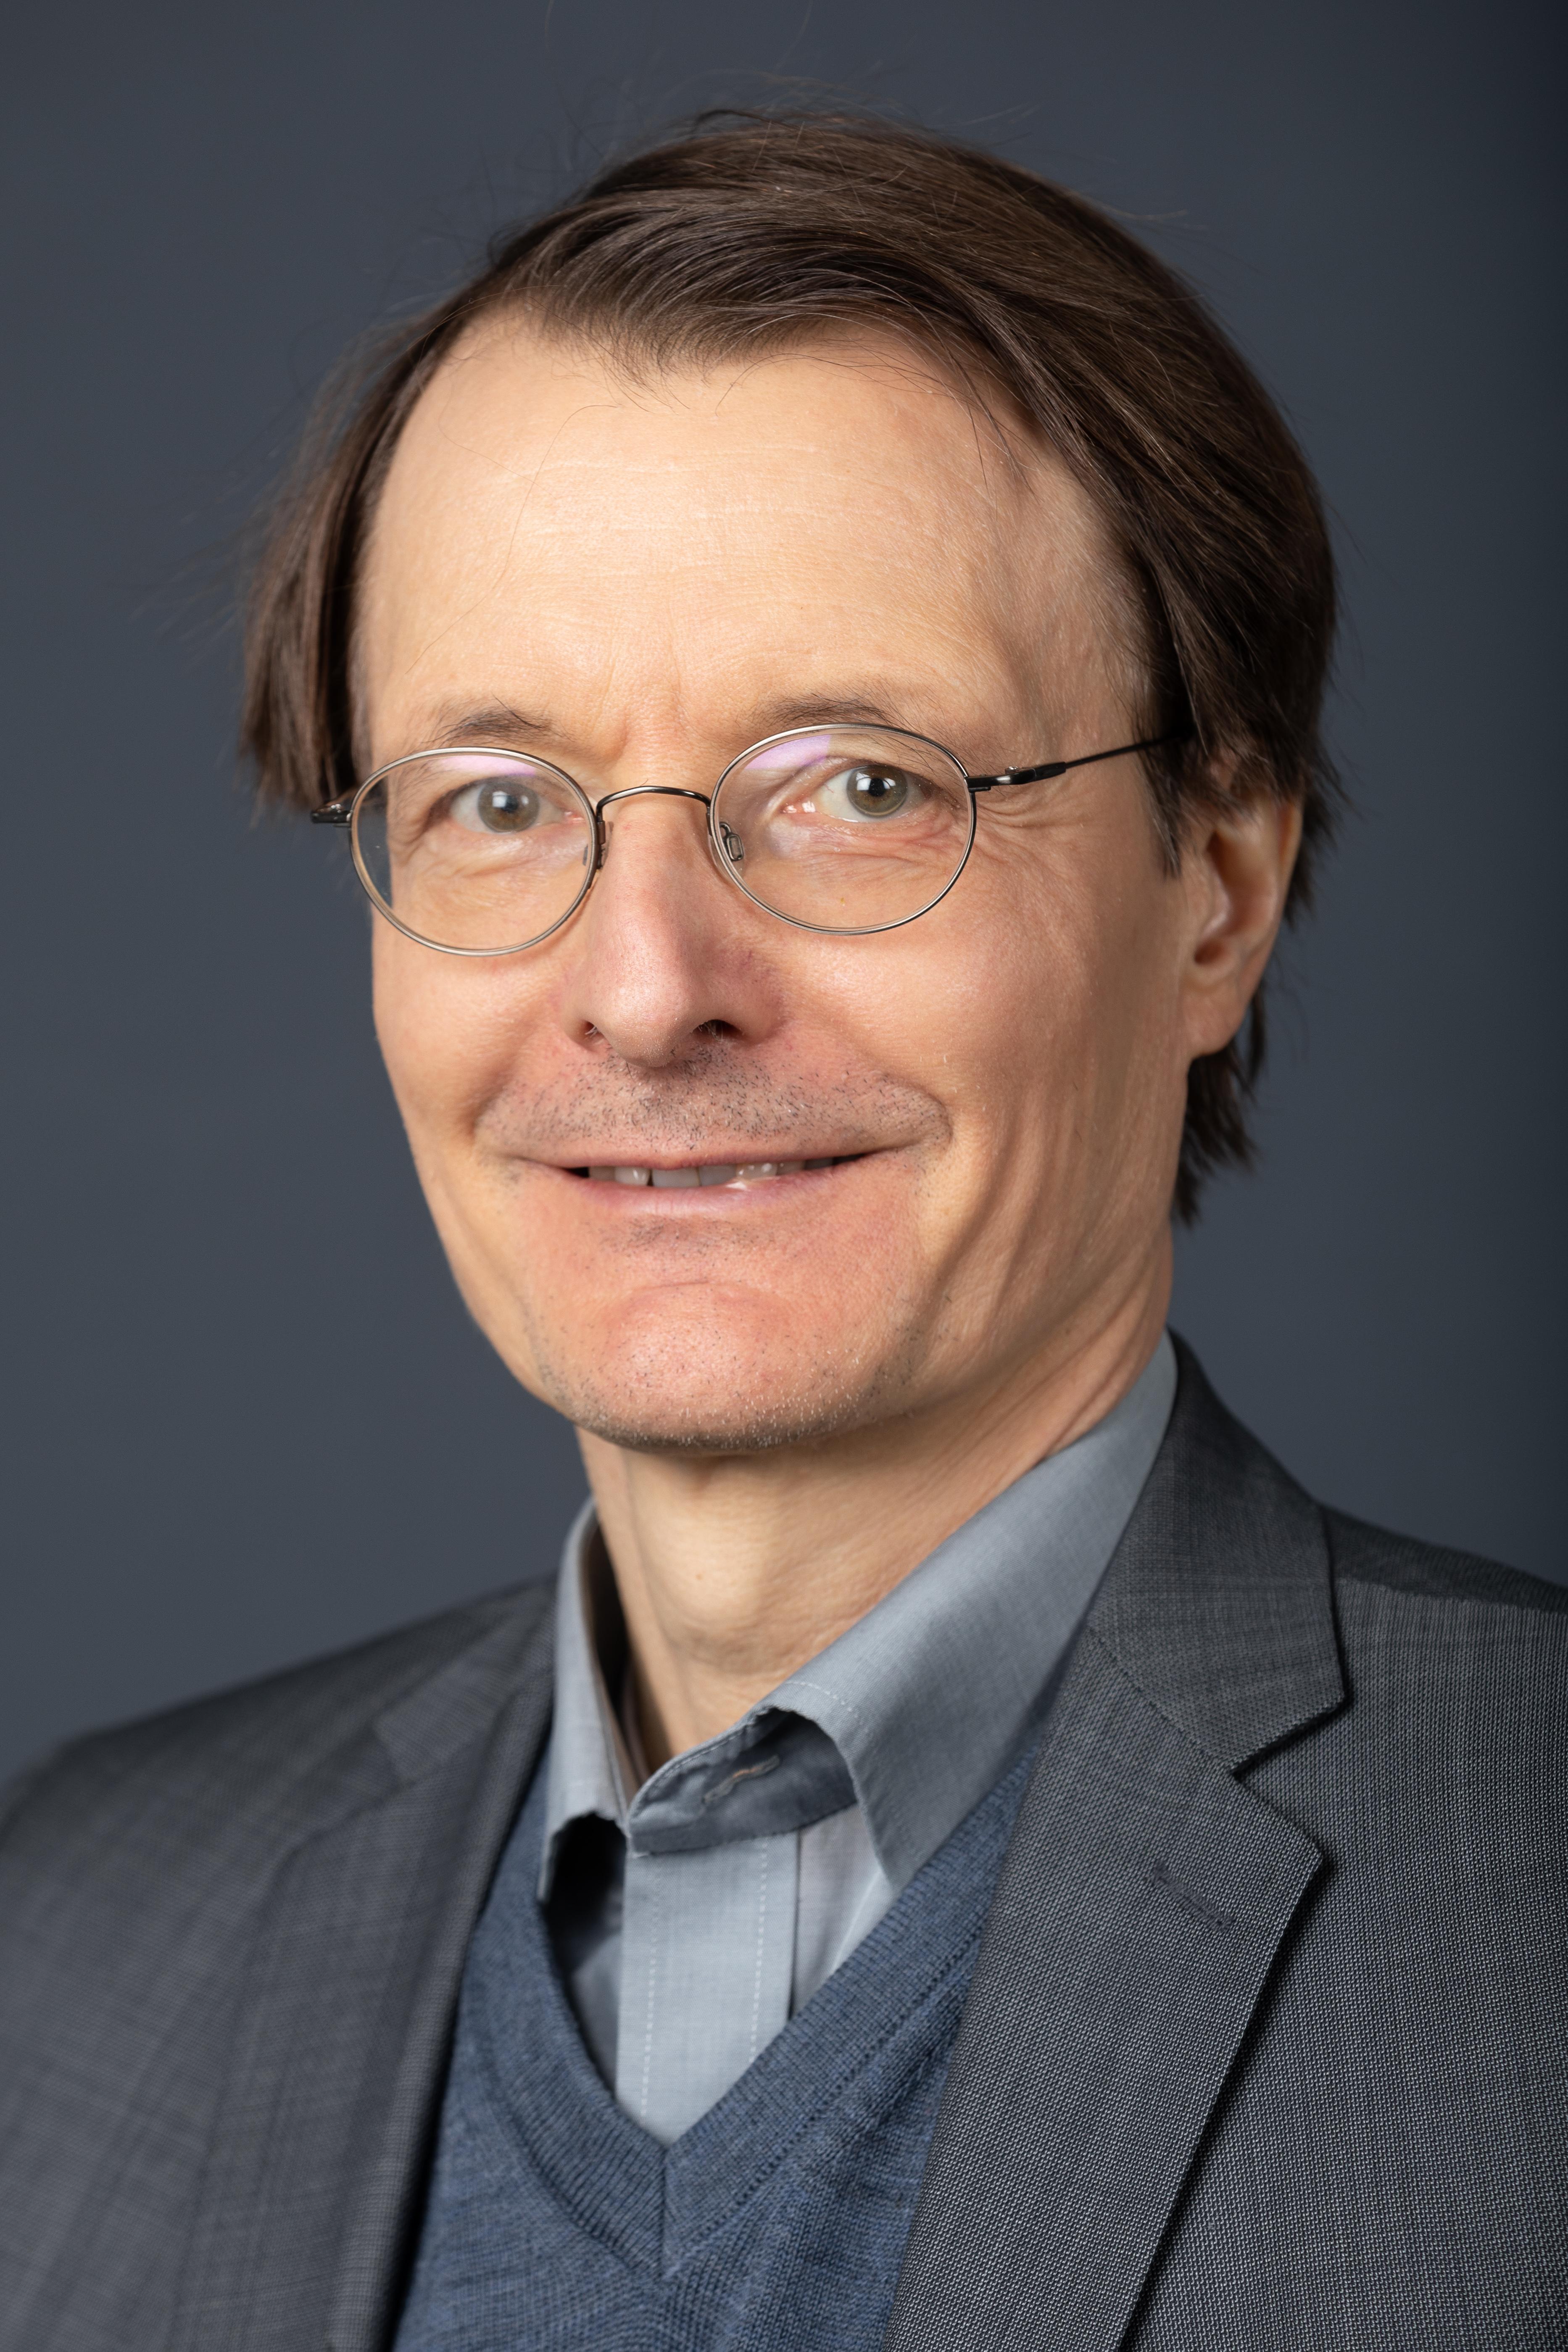 Karl Lauterbach Wikipedia